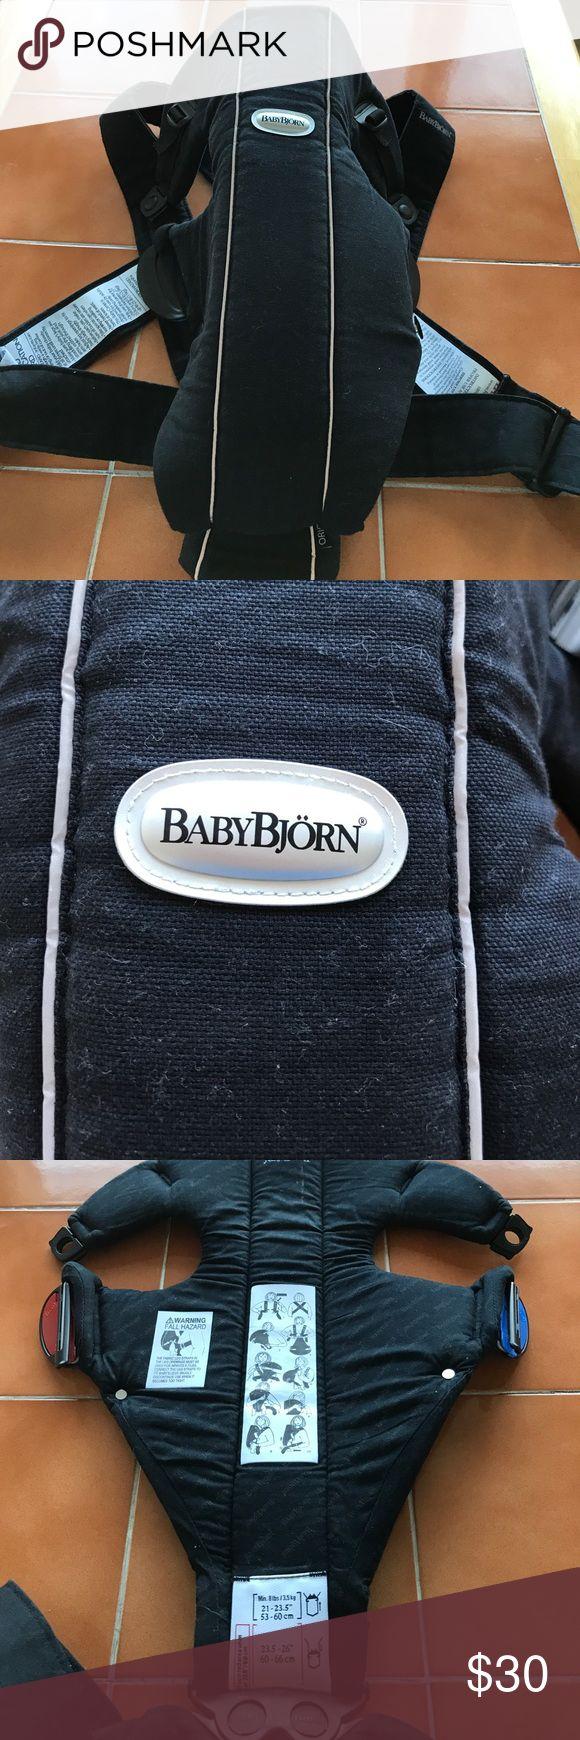 Baby Bjorn Original Carrier in black Hardly used Baby Bjorn Original Carrier in black. Great condition!! Baby Bjorn Other